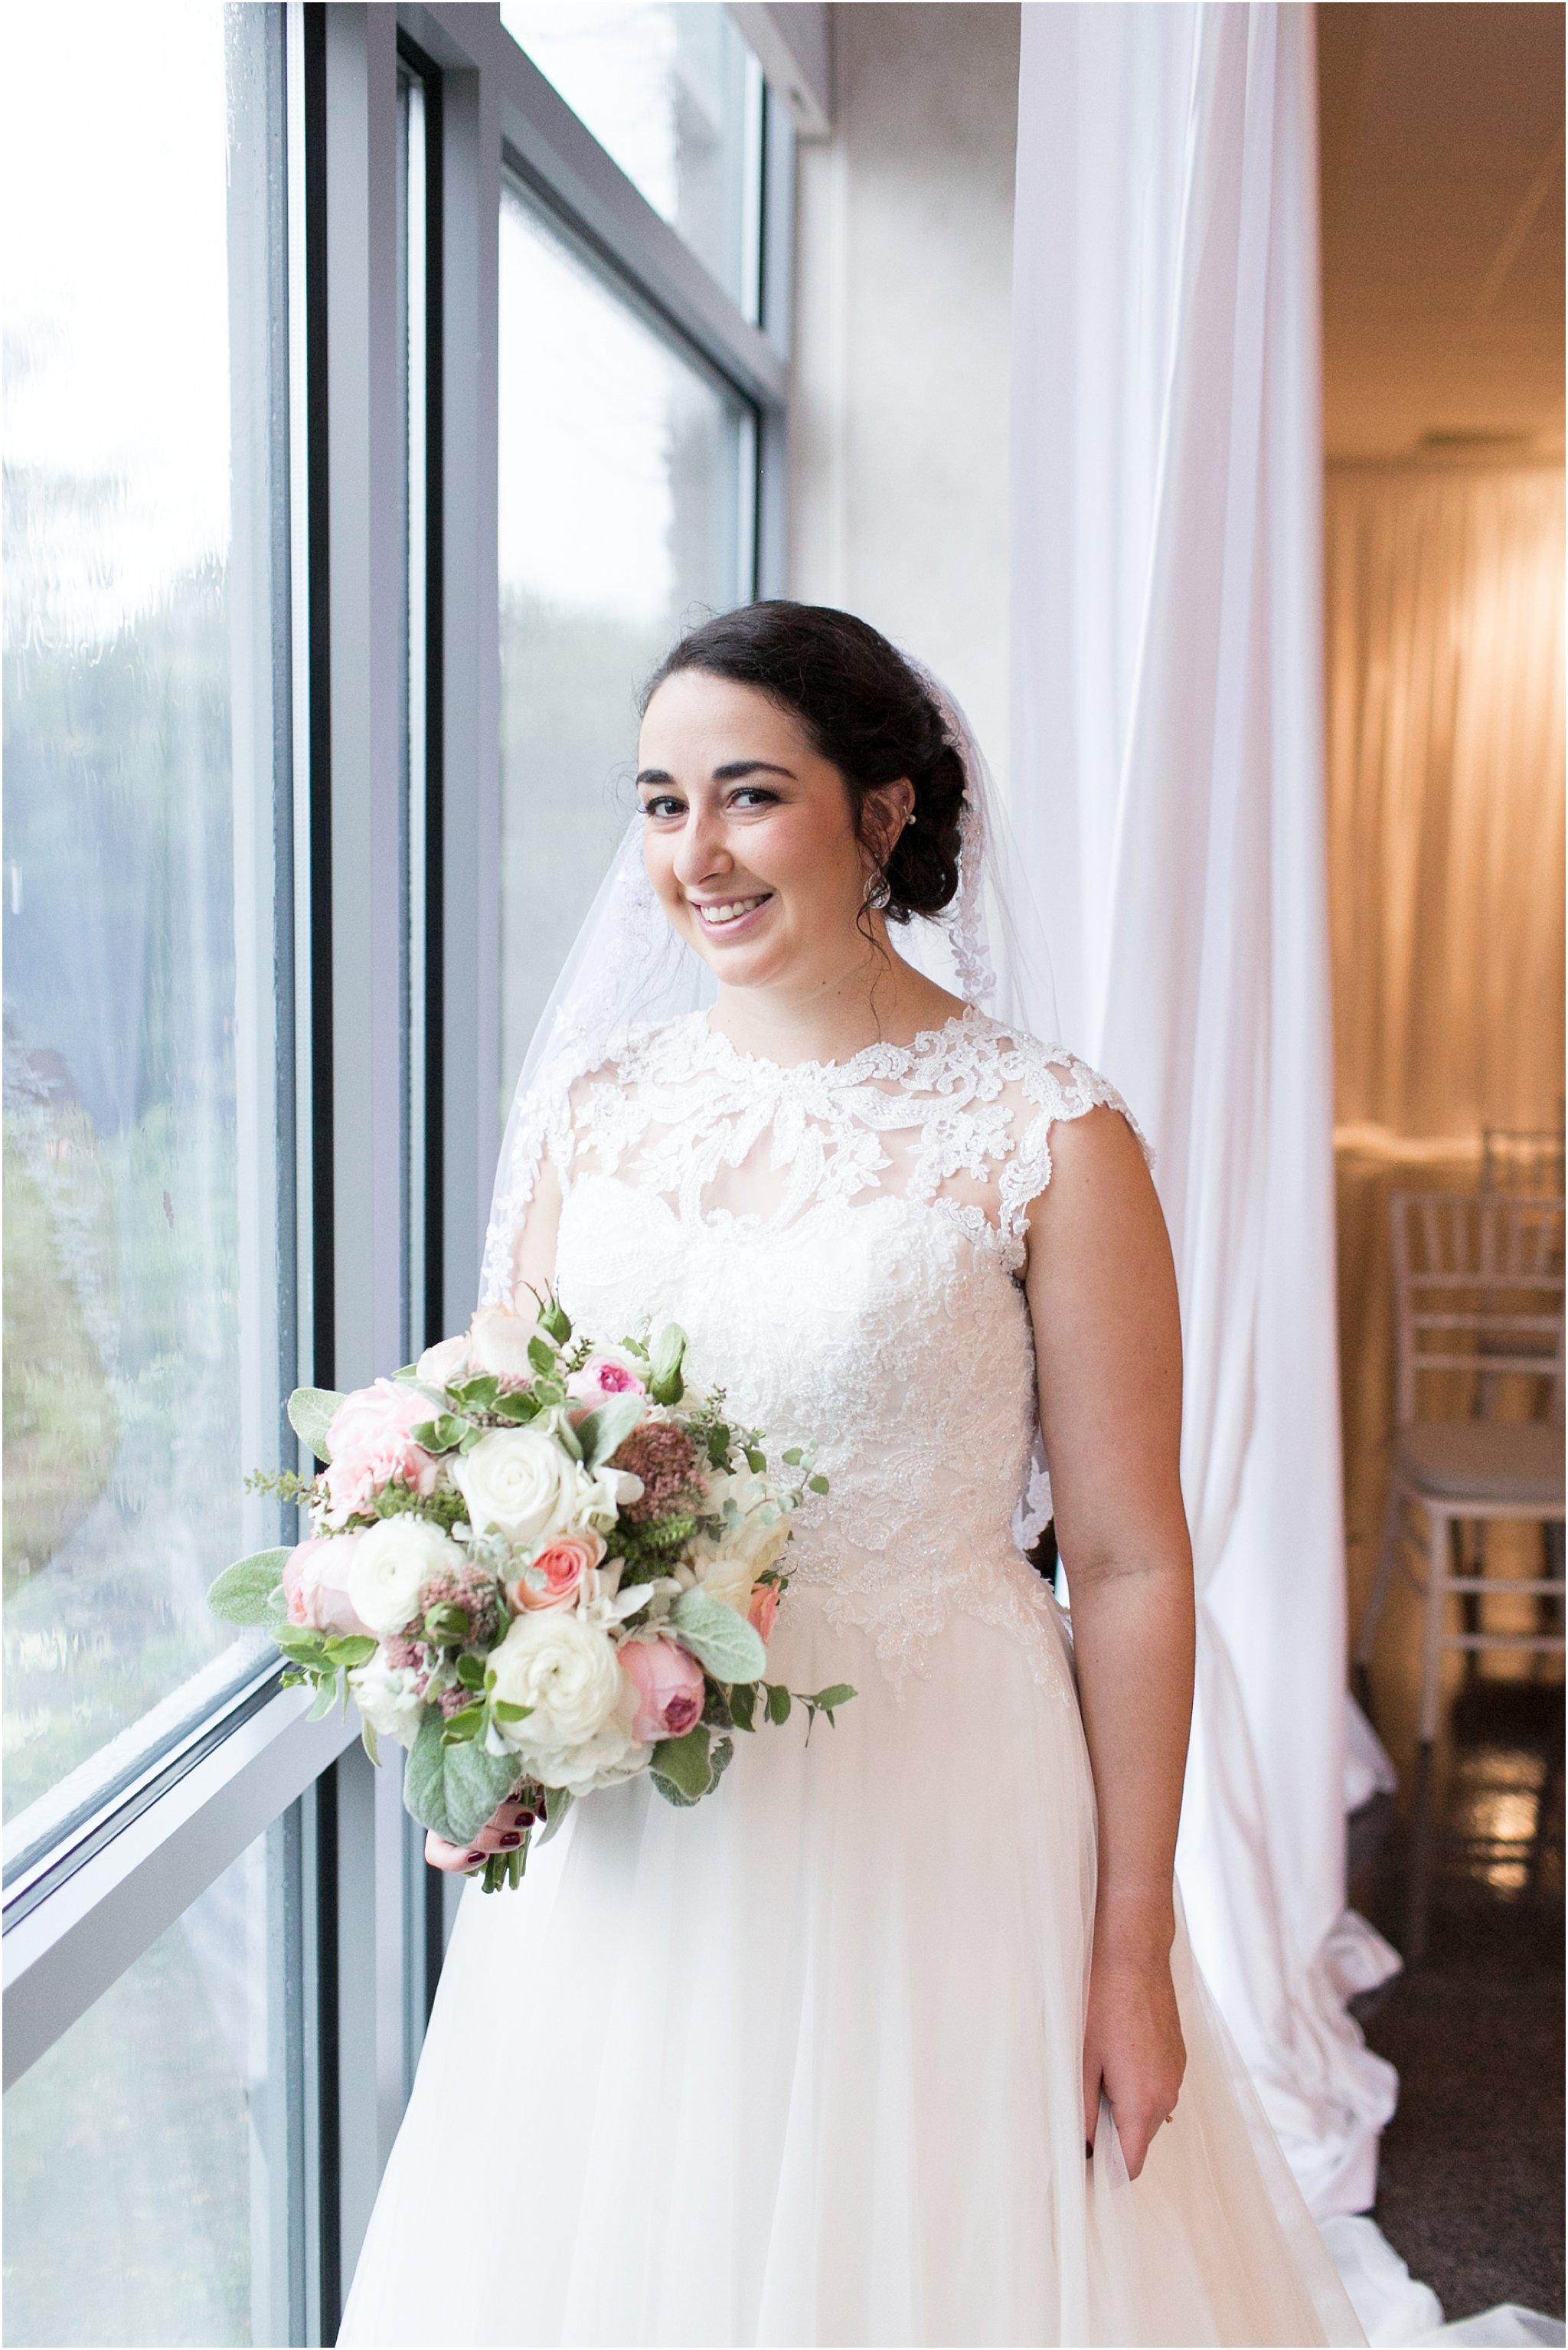 jessica_ryan_photography_virginia_wedding_photographer_wedding_hurricane_norfolk_botanical_gardens_hurricane_matthew_wedding_3576